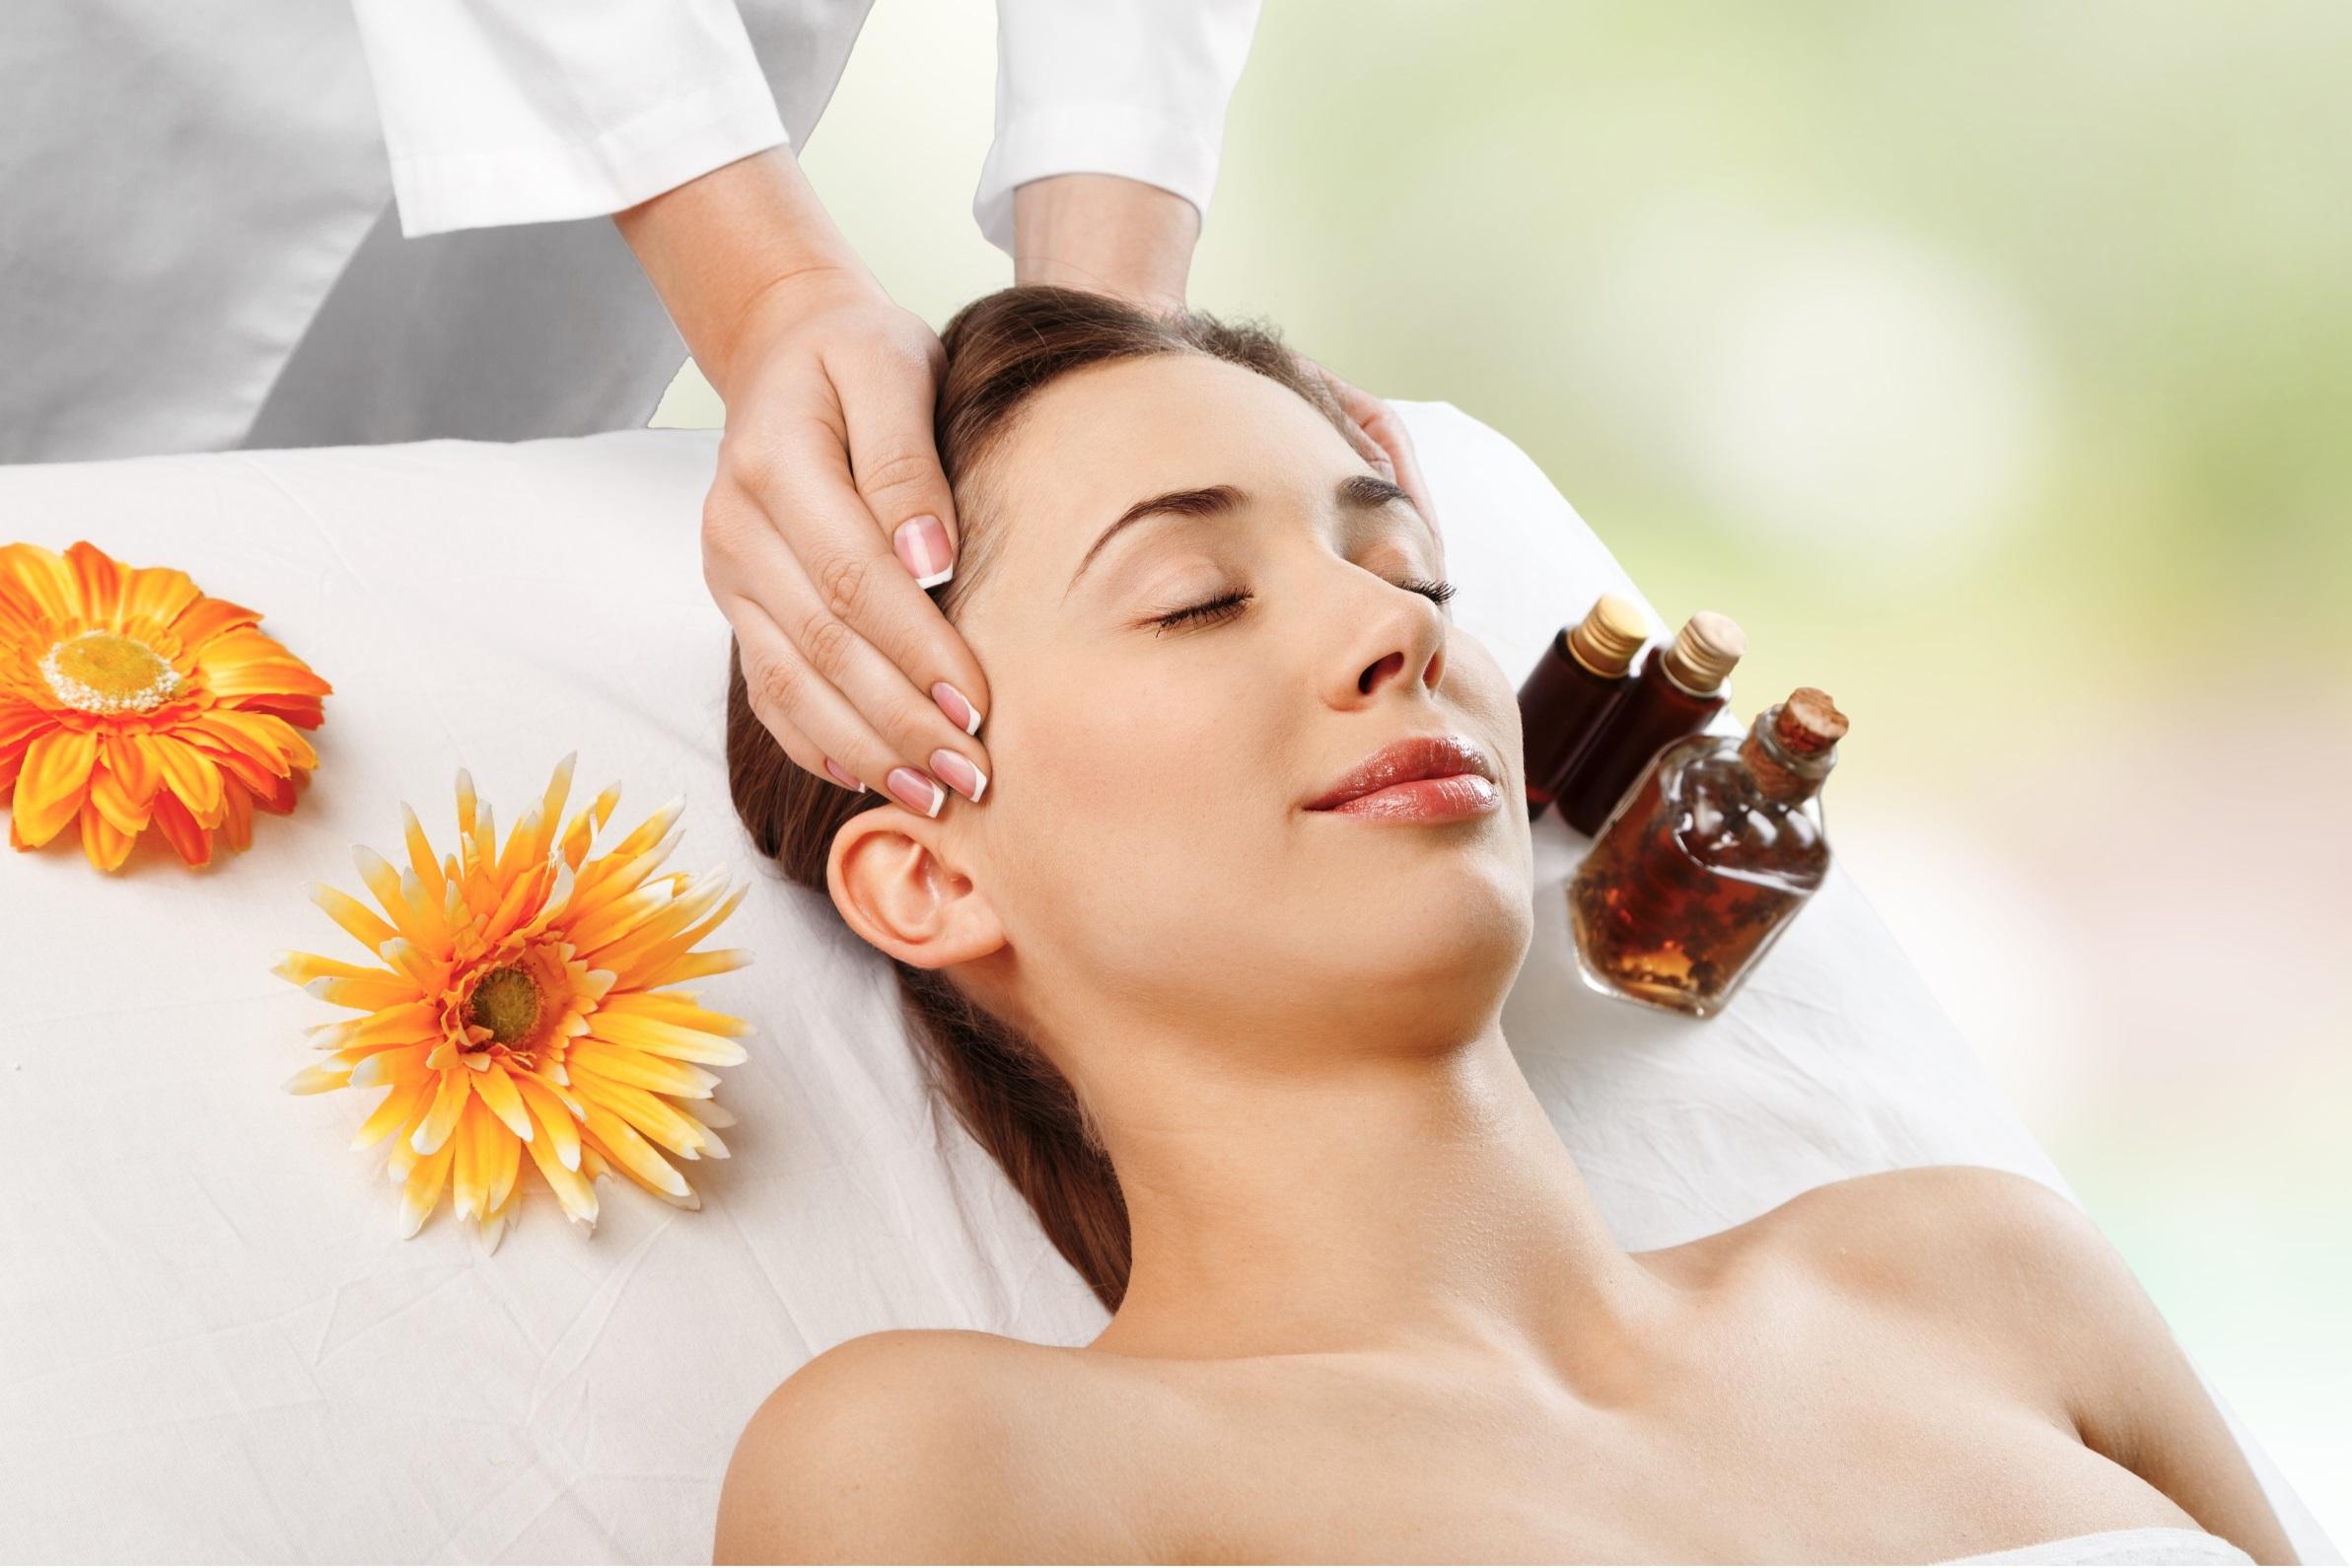 Massage with essential oils